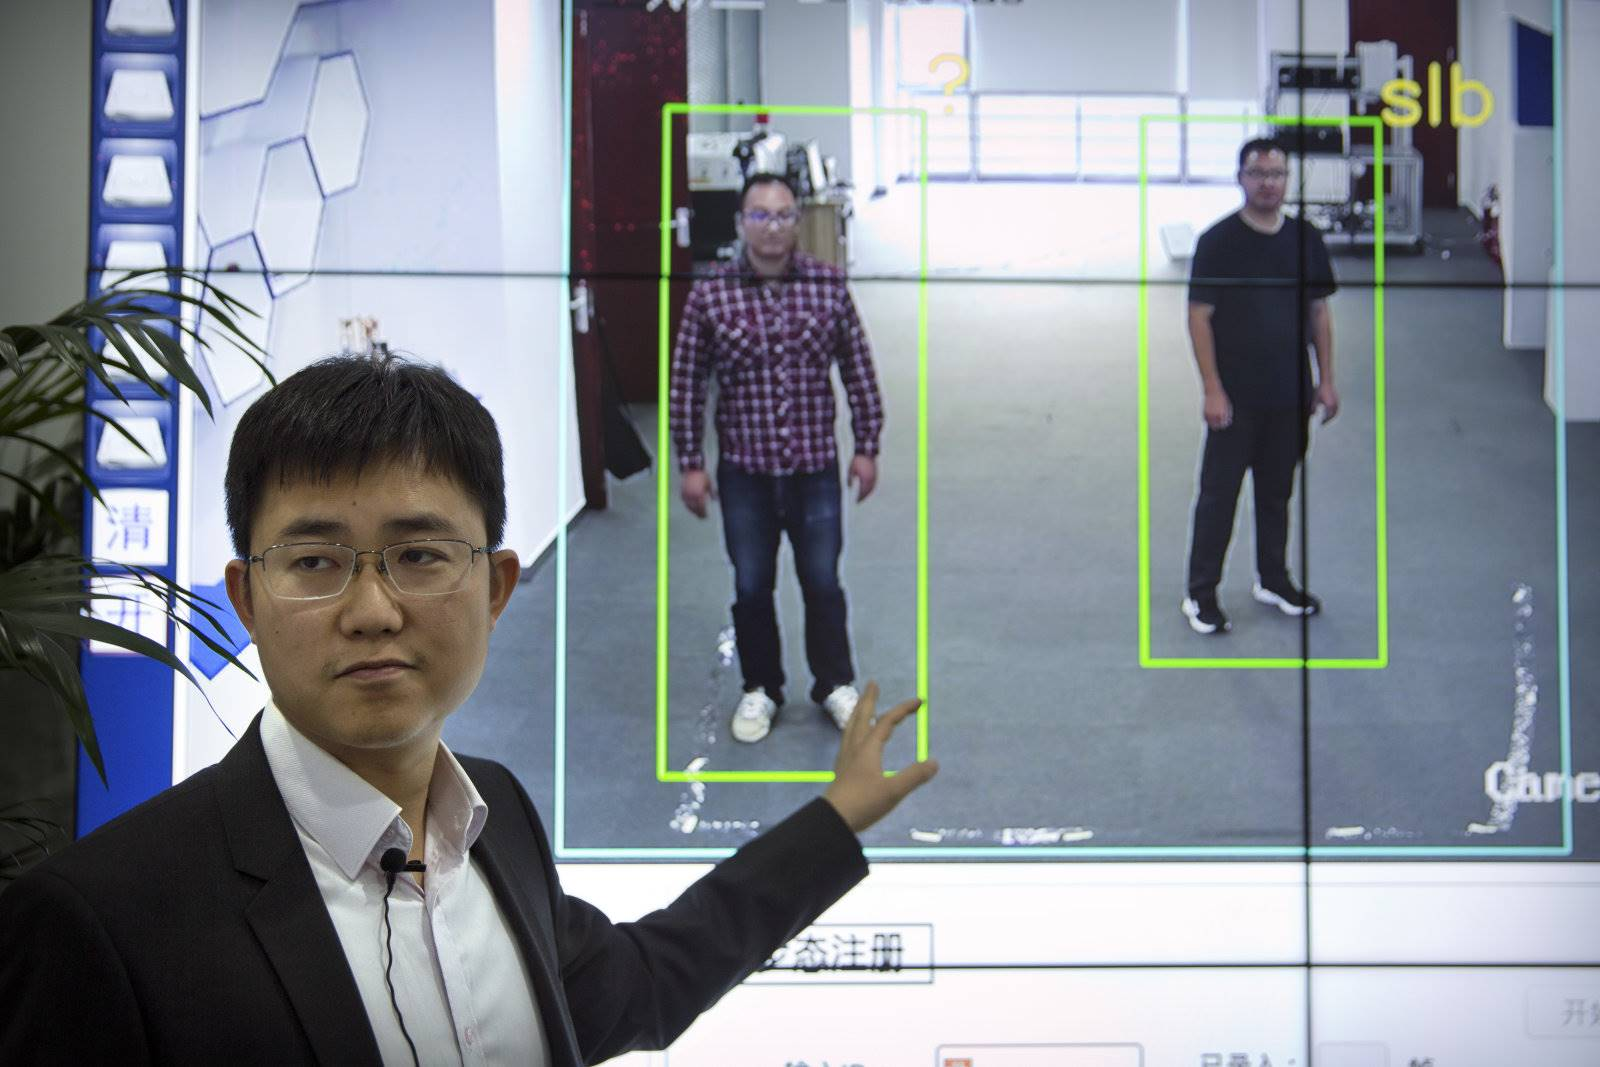 inteligenta artificiala recunoaste mers 1